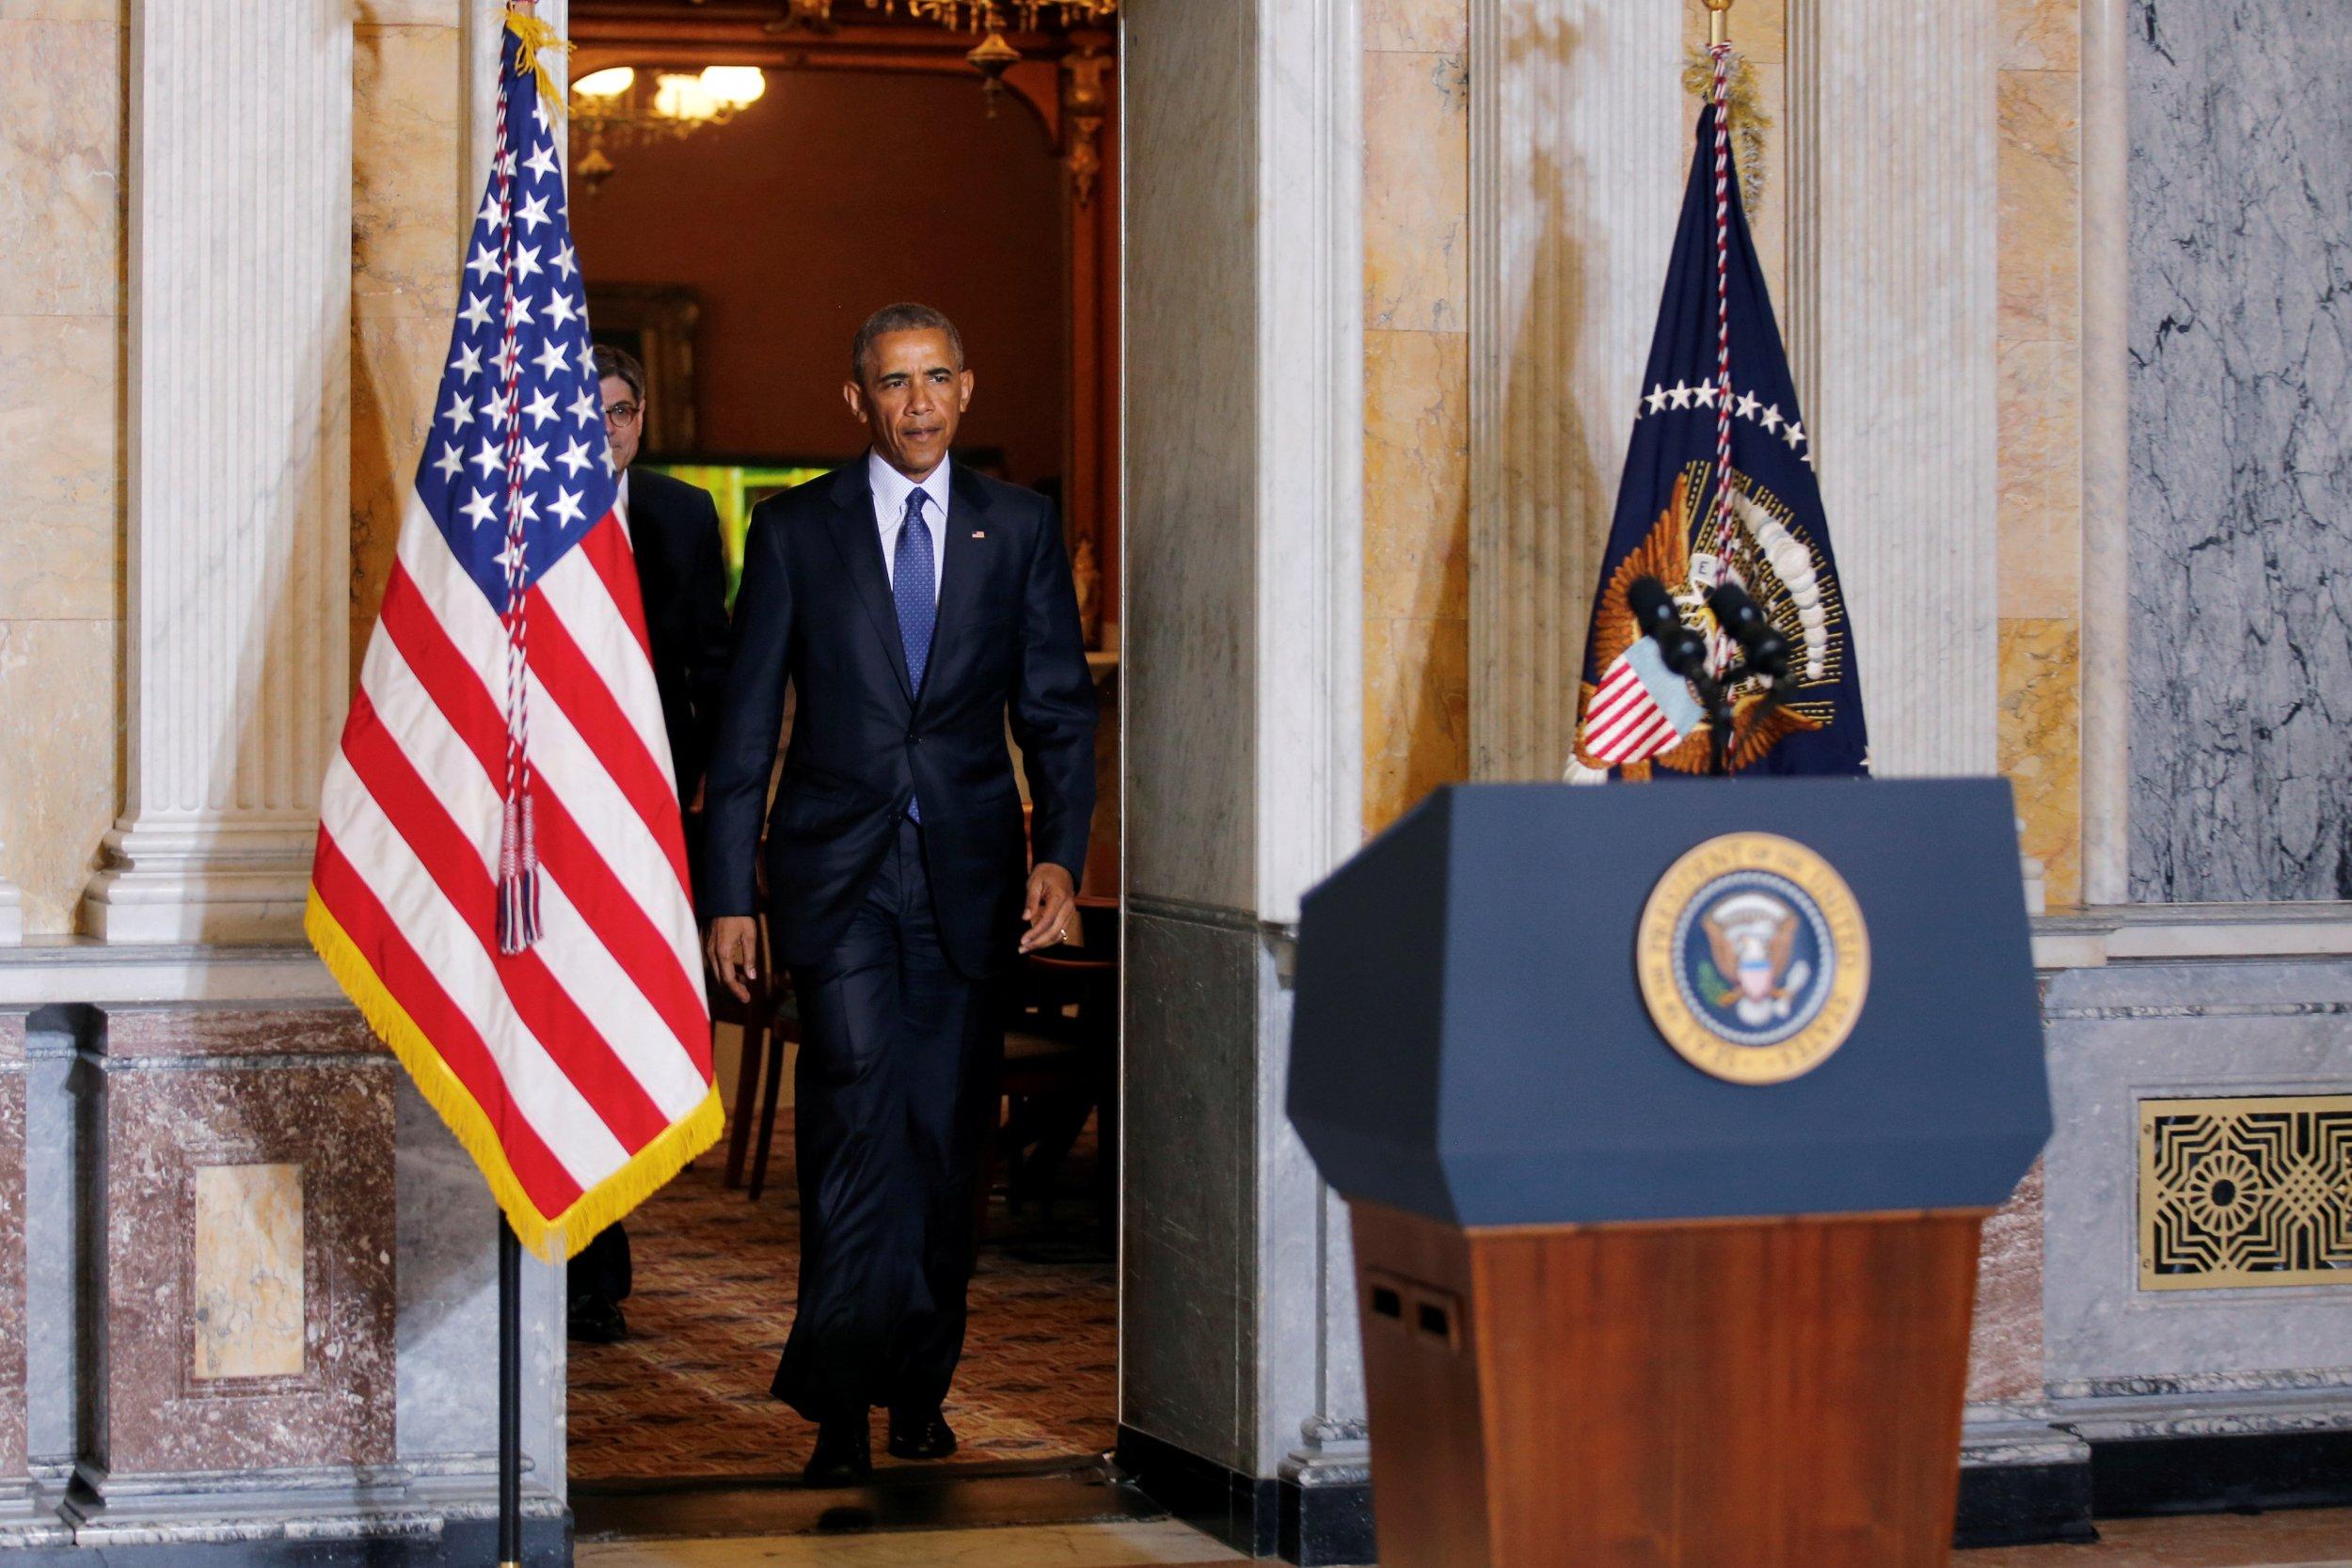 0614_Obama_speech_01